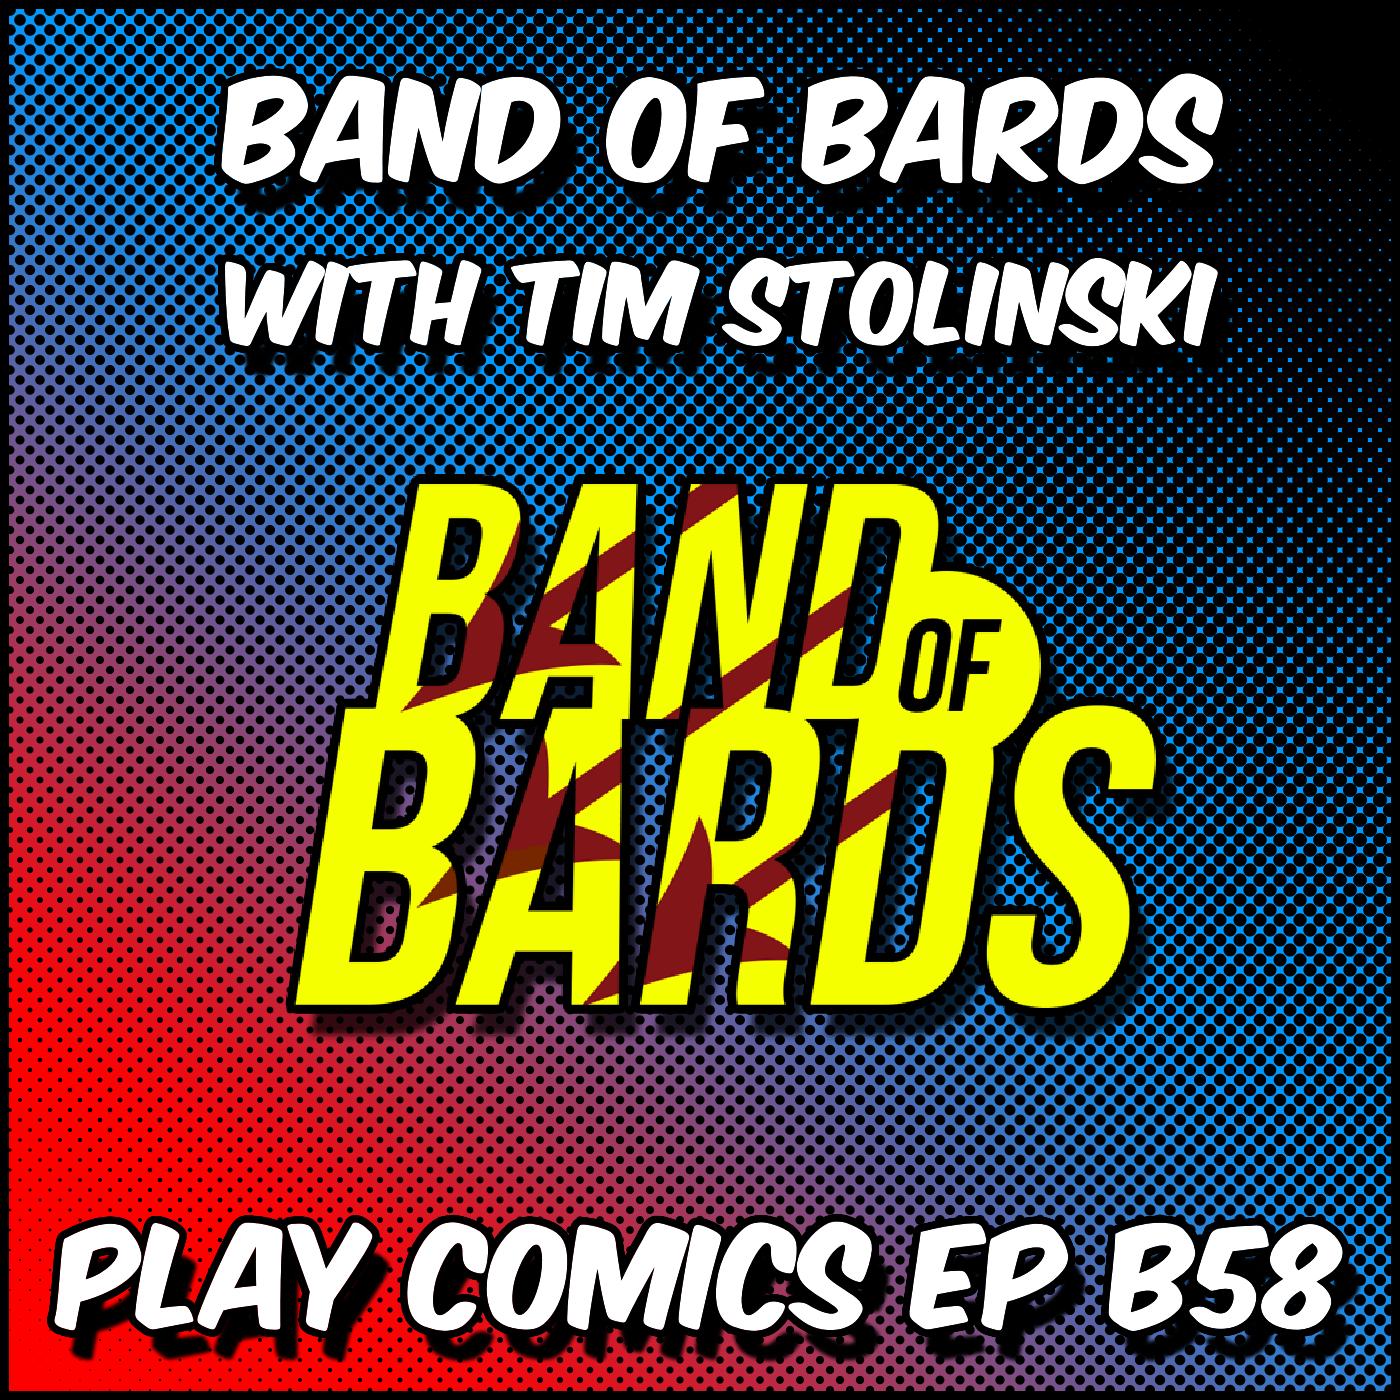 Band of Bards with Tom Stolinski